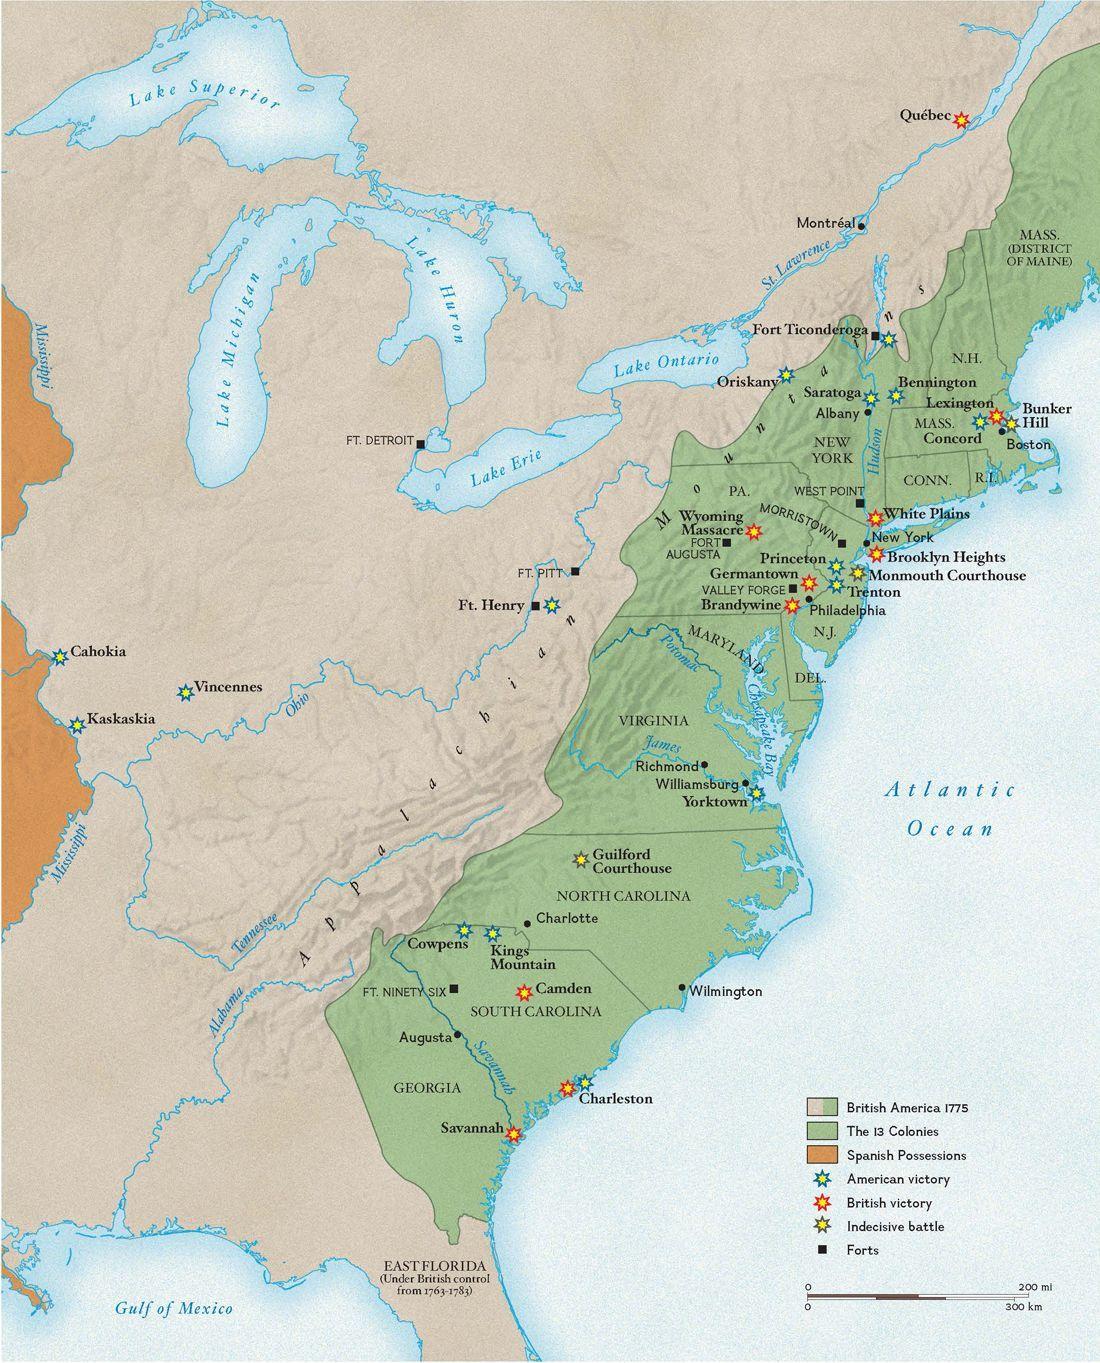 America S War For Independence Began On April 19